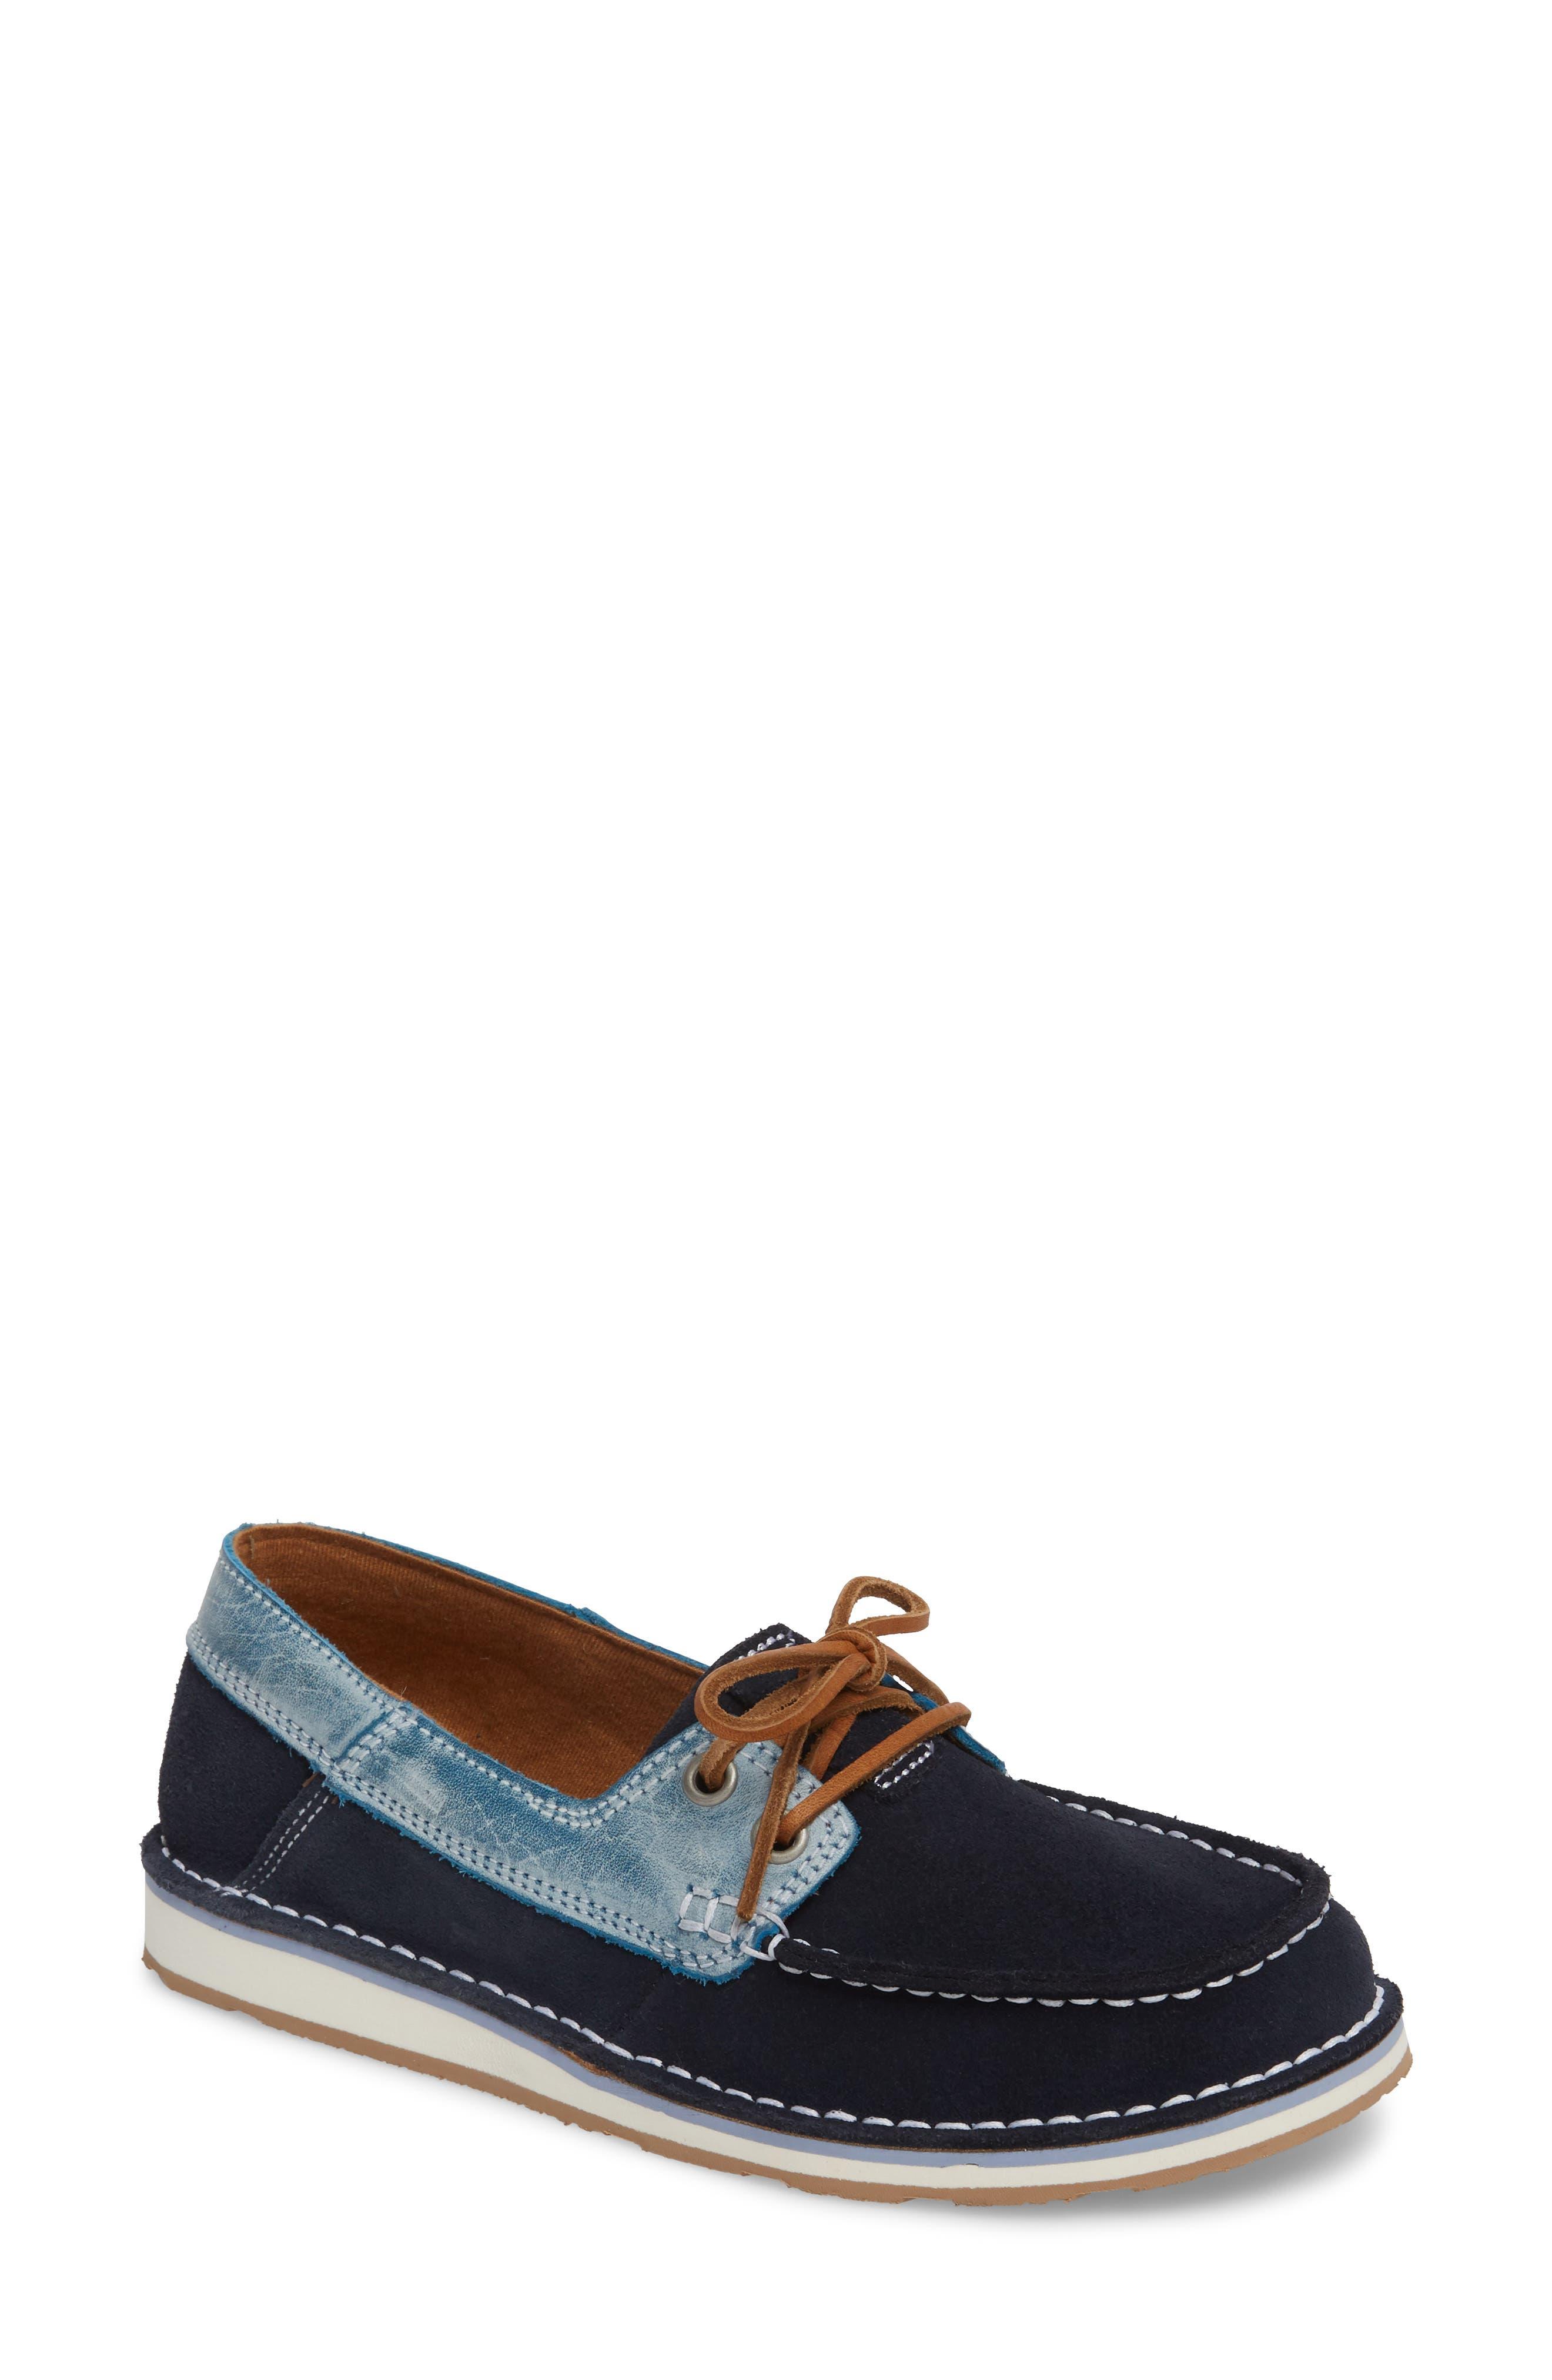 Cruiser Castaway Loafer, Ice Blue Suede